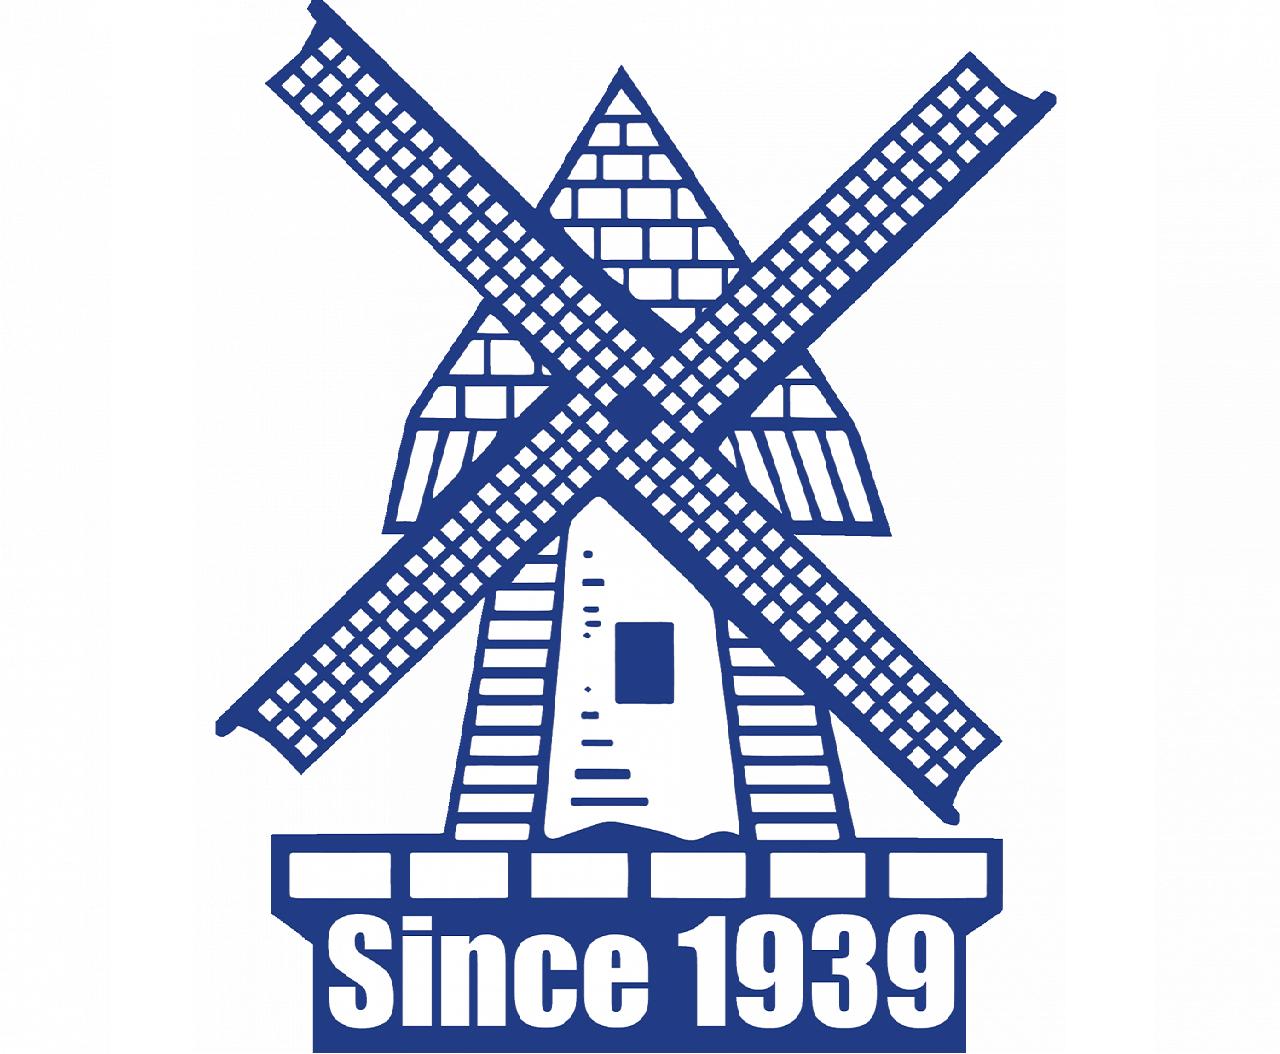 n14 celect cummins n14 celect price 5500 00 [ 1280 x 956 Pixel ]